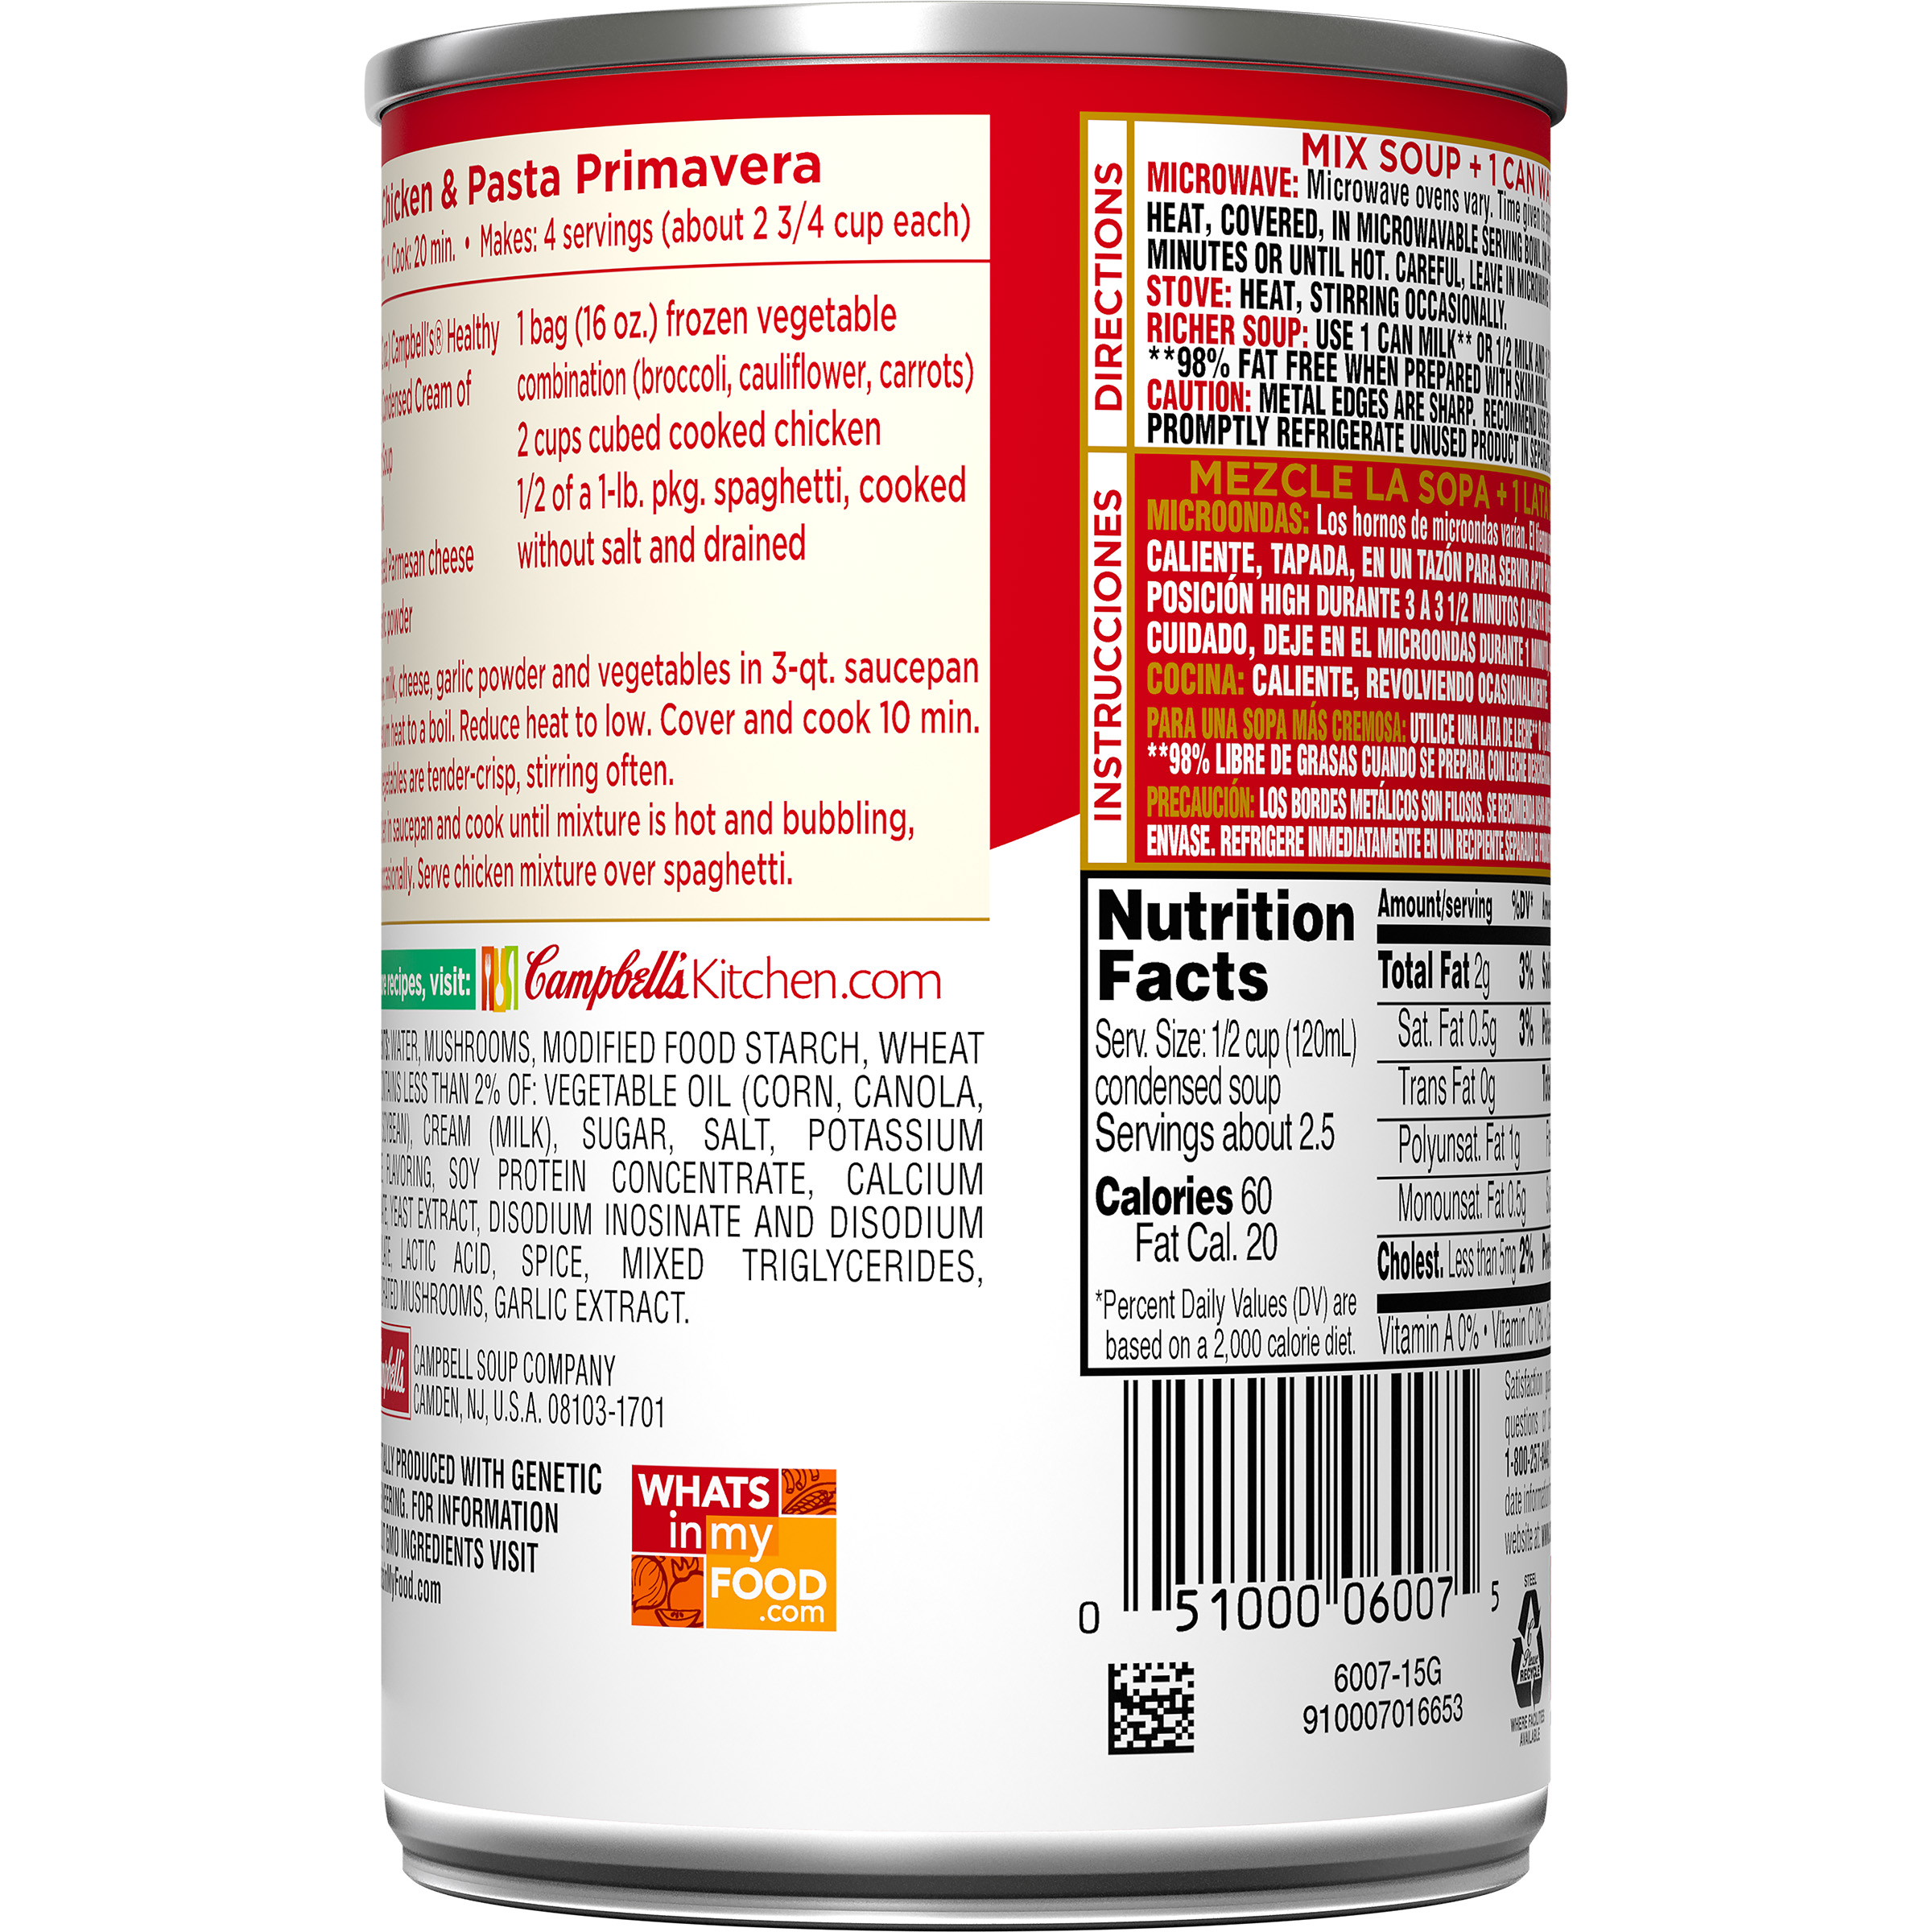 Campbellu0027s Condensed Healthy Request Cream Of Mushroom Soup, 10.5 Oz.    Walmart.com